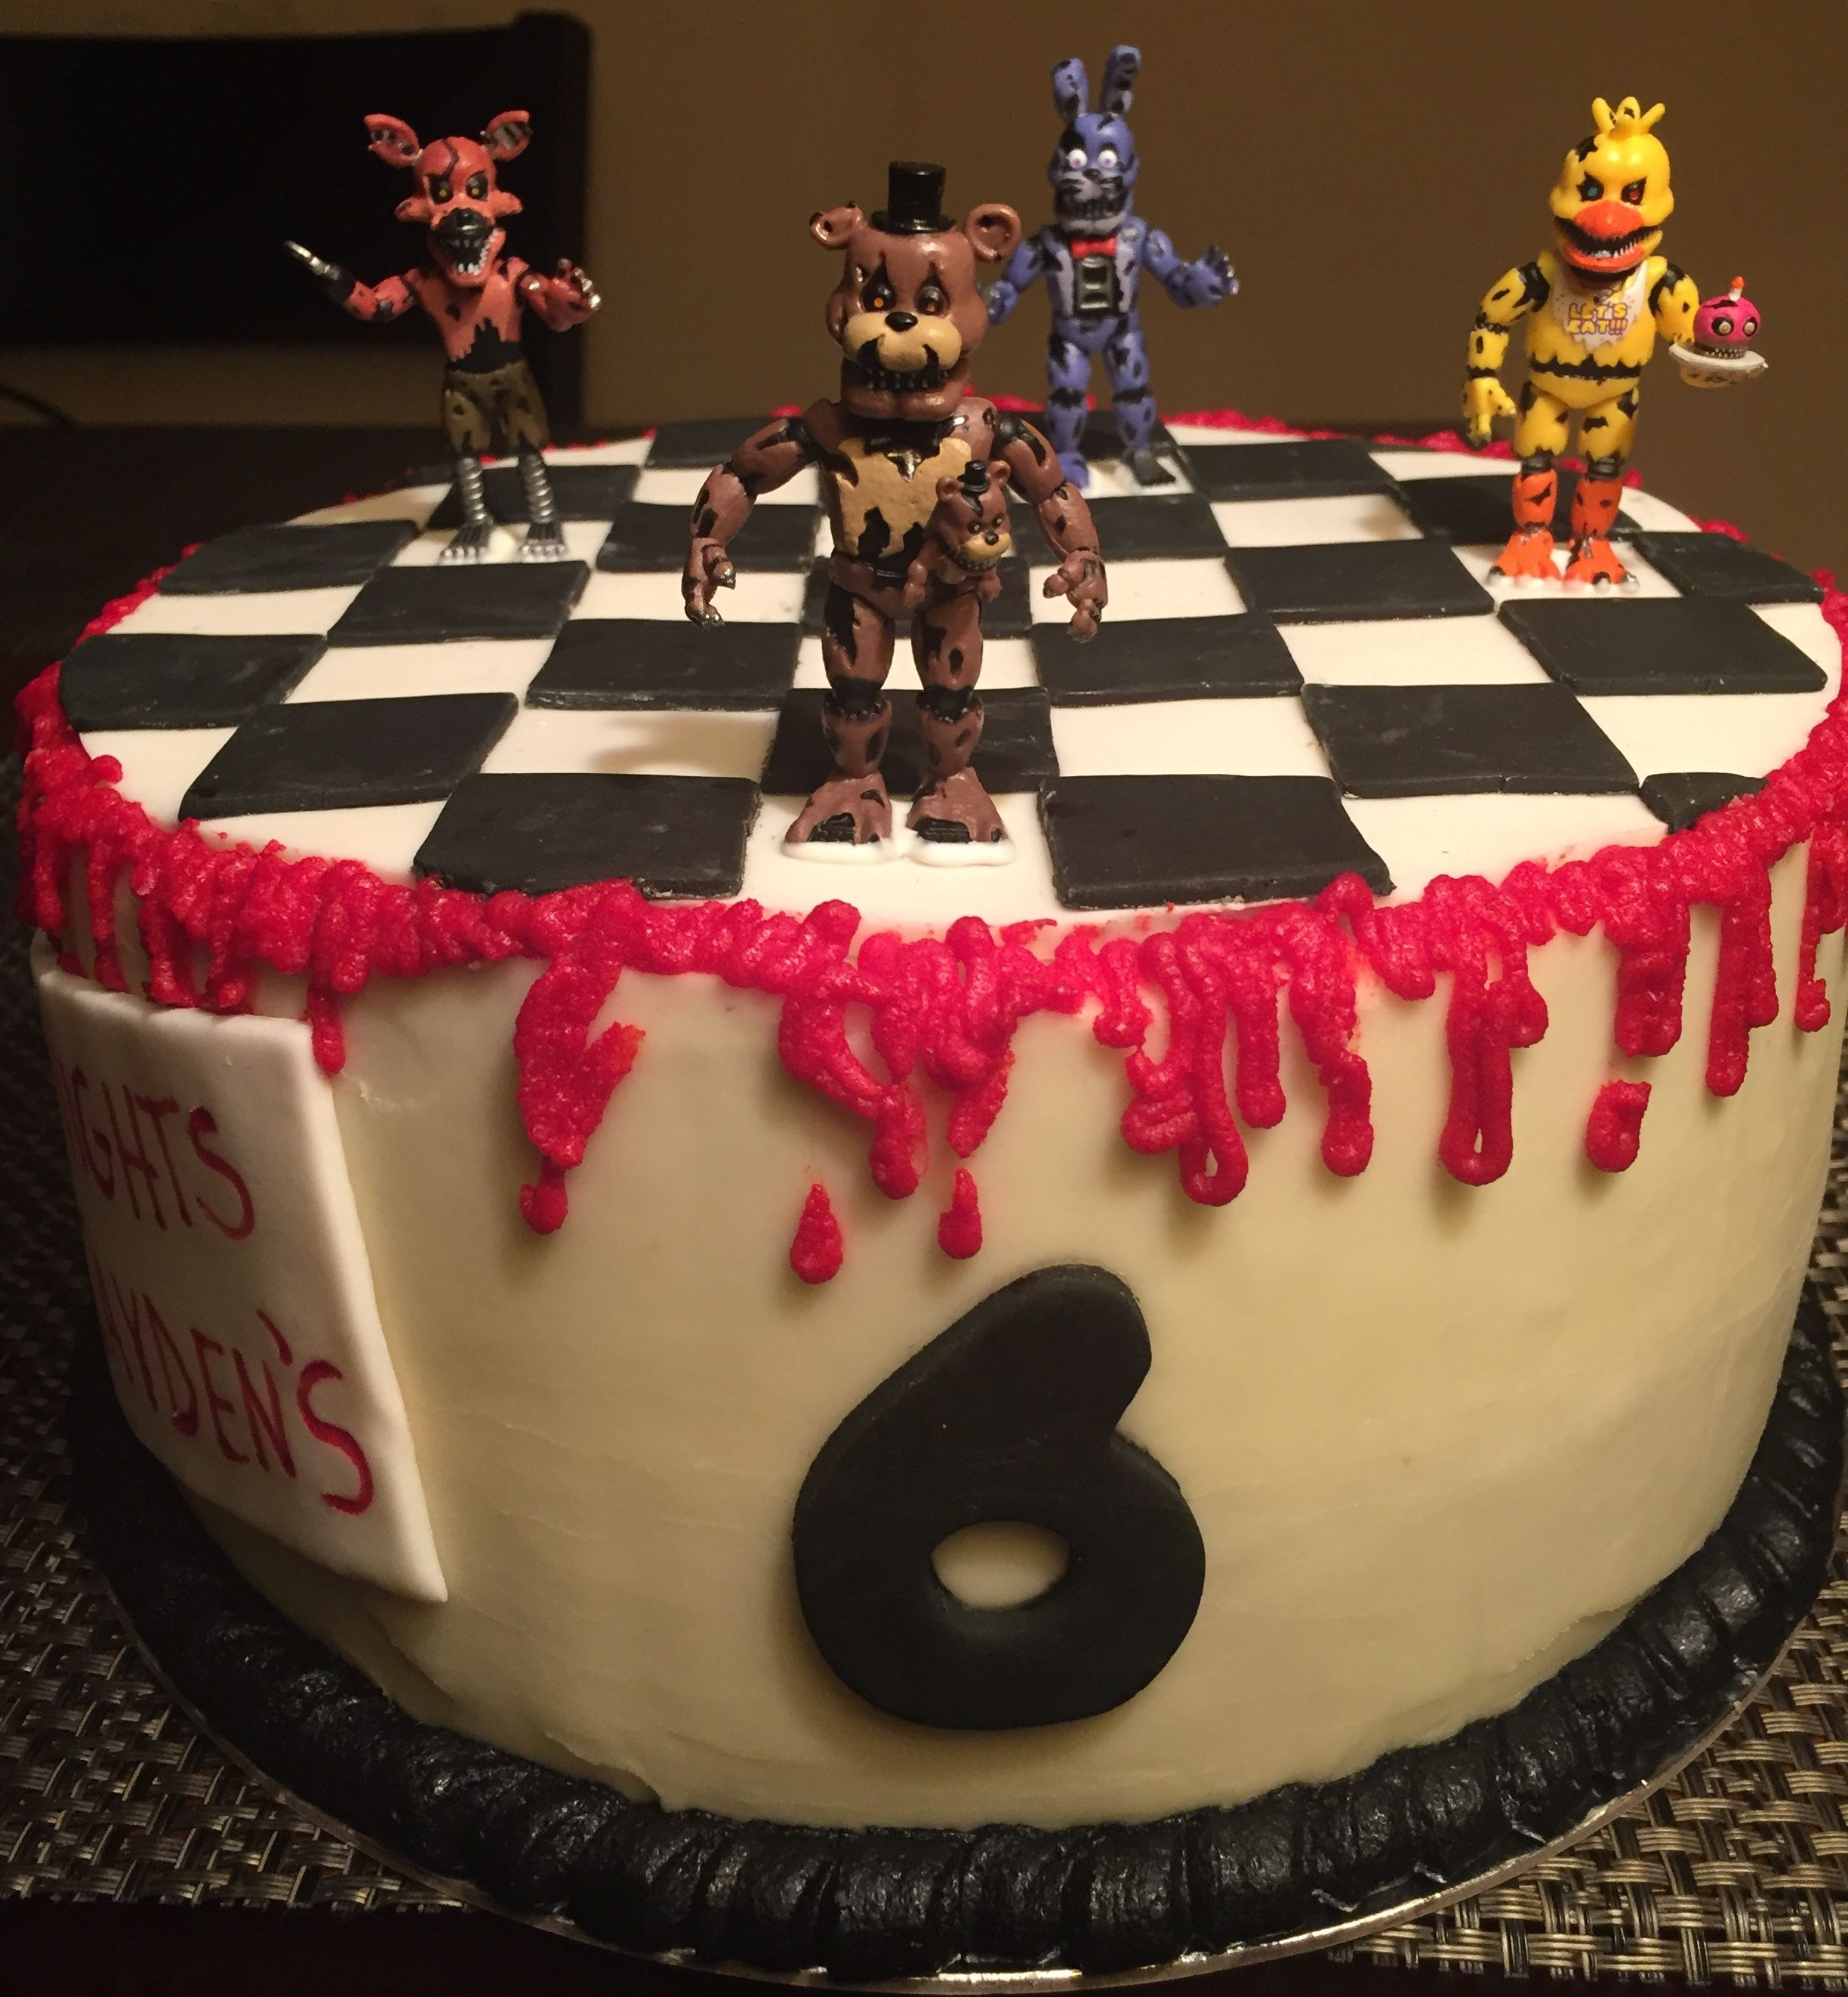 Five nights at freddys theme bday cake vanilla cake w